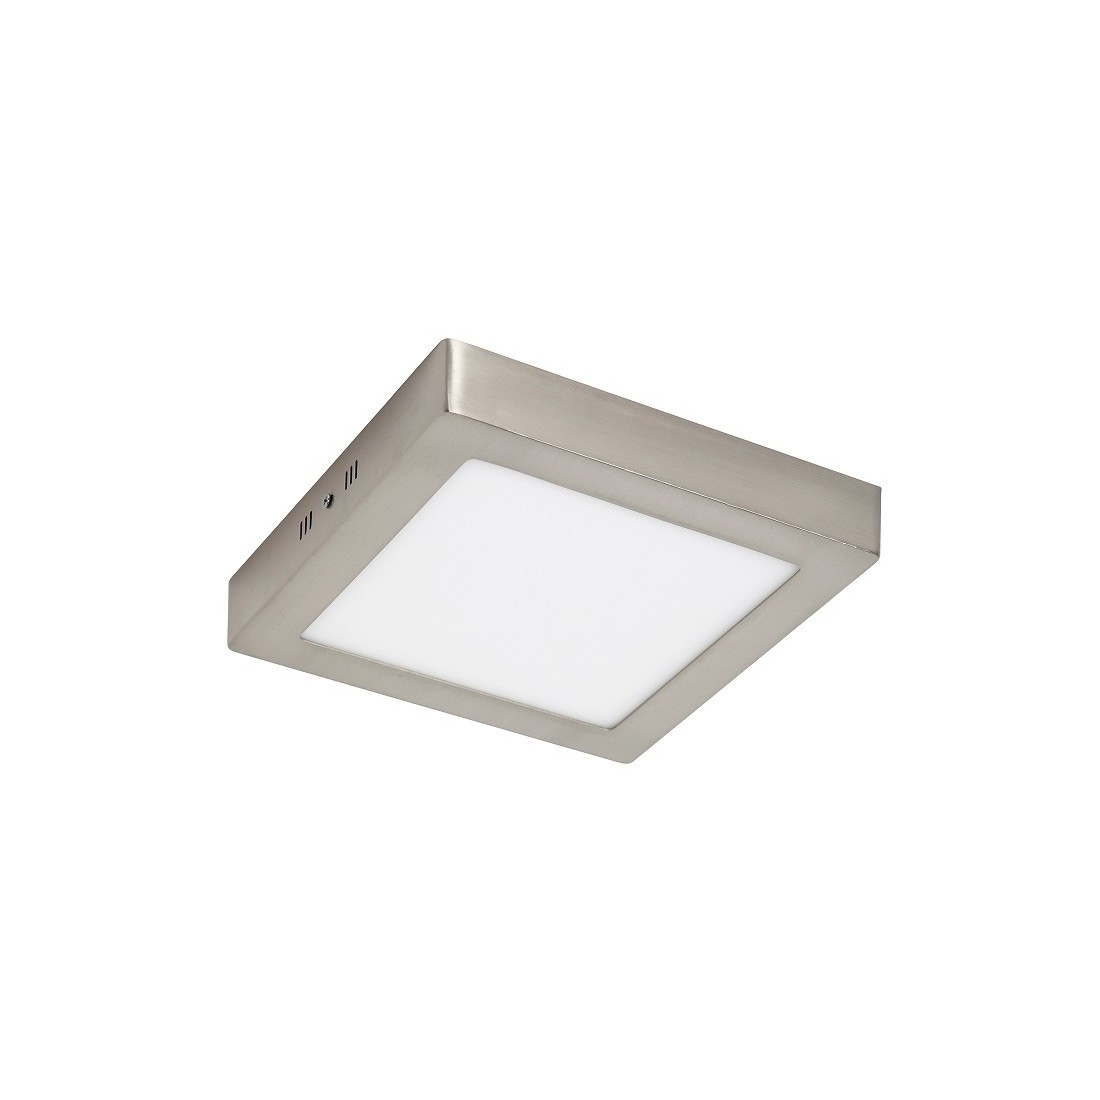 Lamparas led lamparas techo led lamparas colgantes led - Lamparas de techo redondas ...